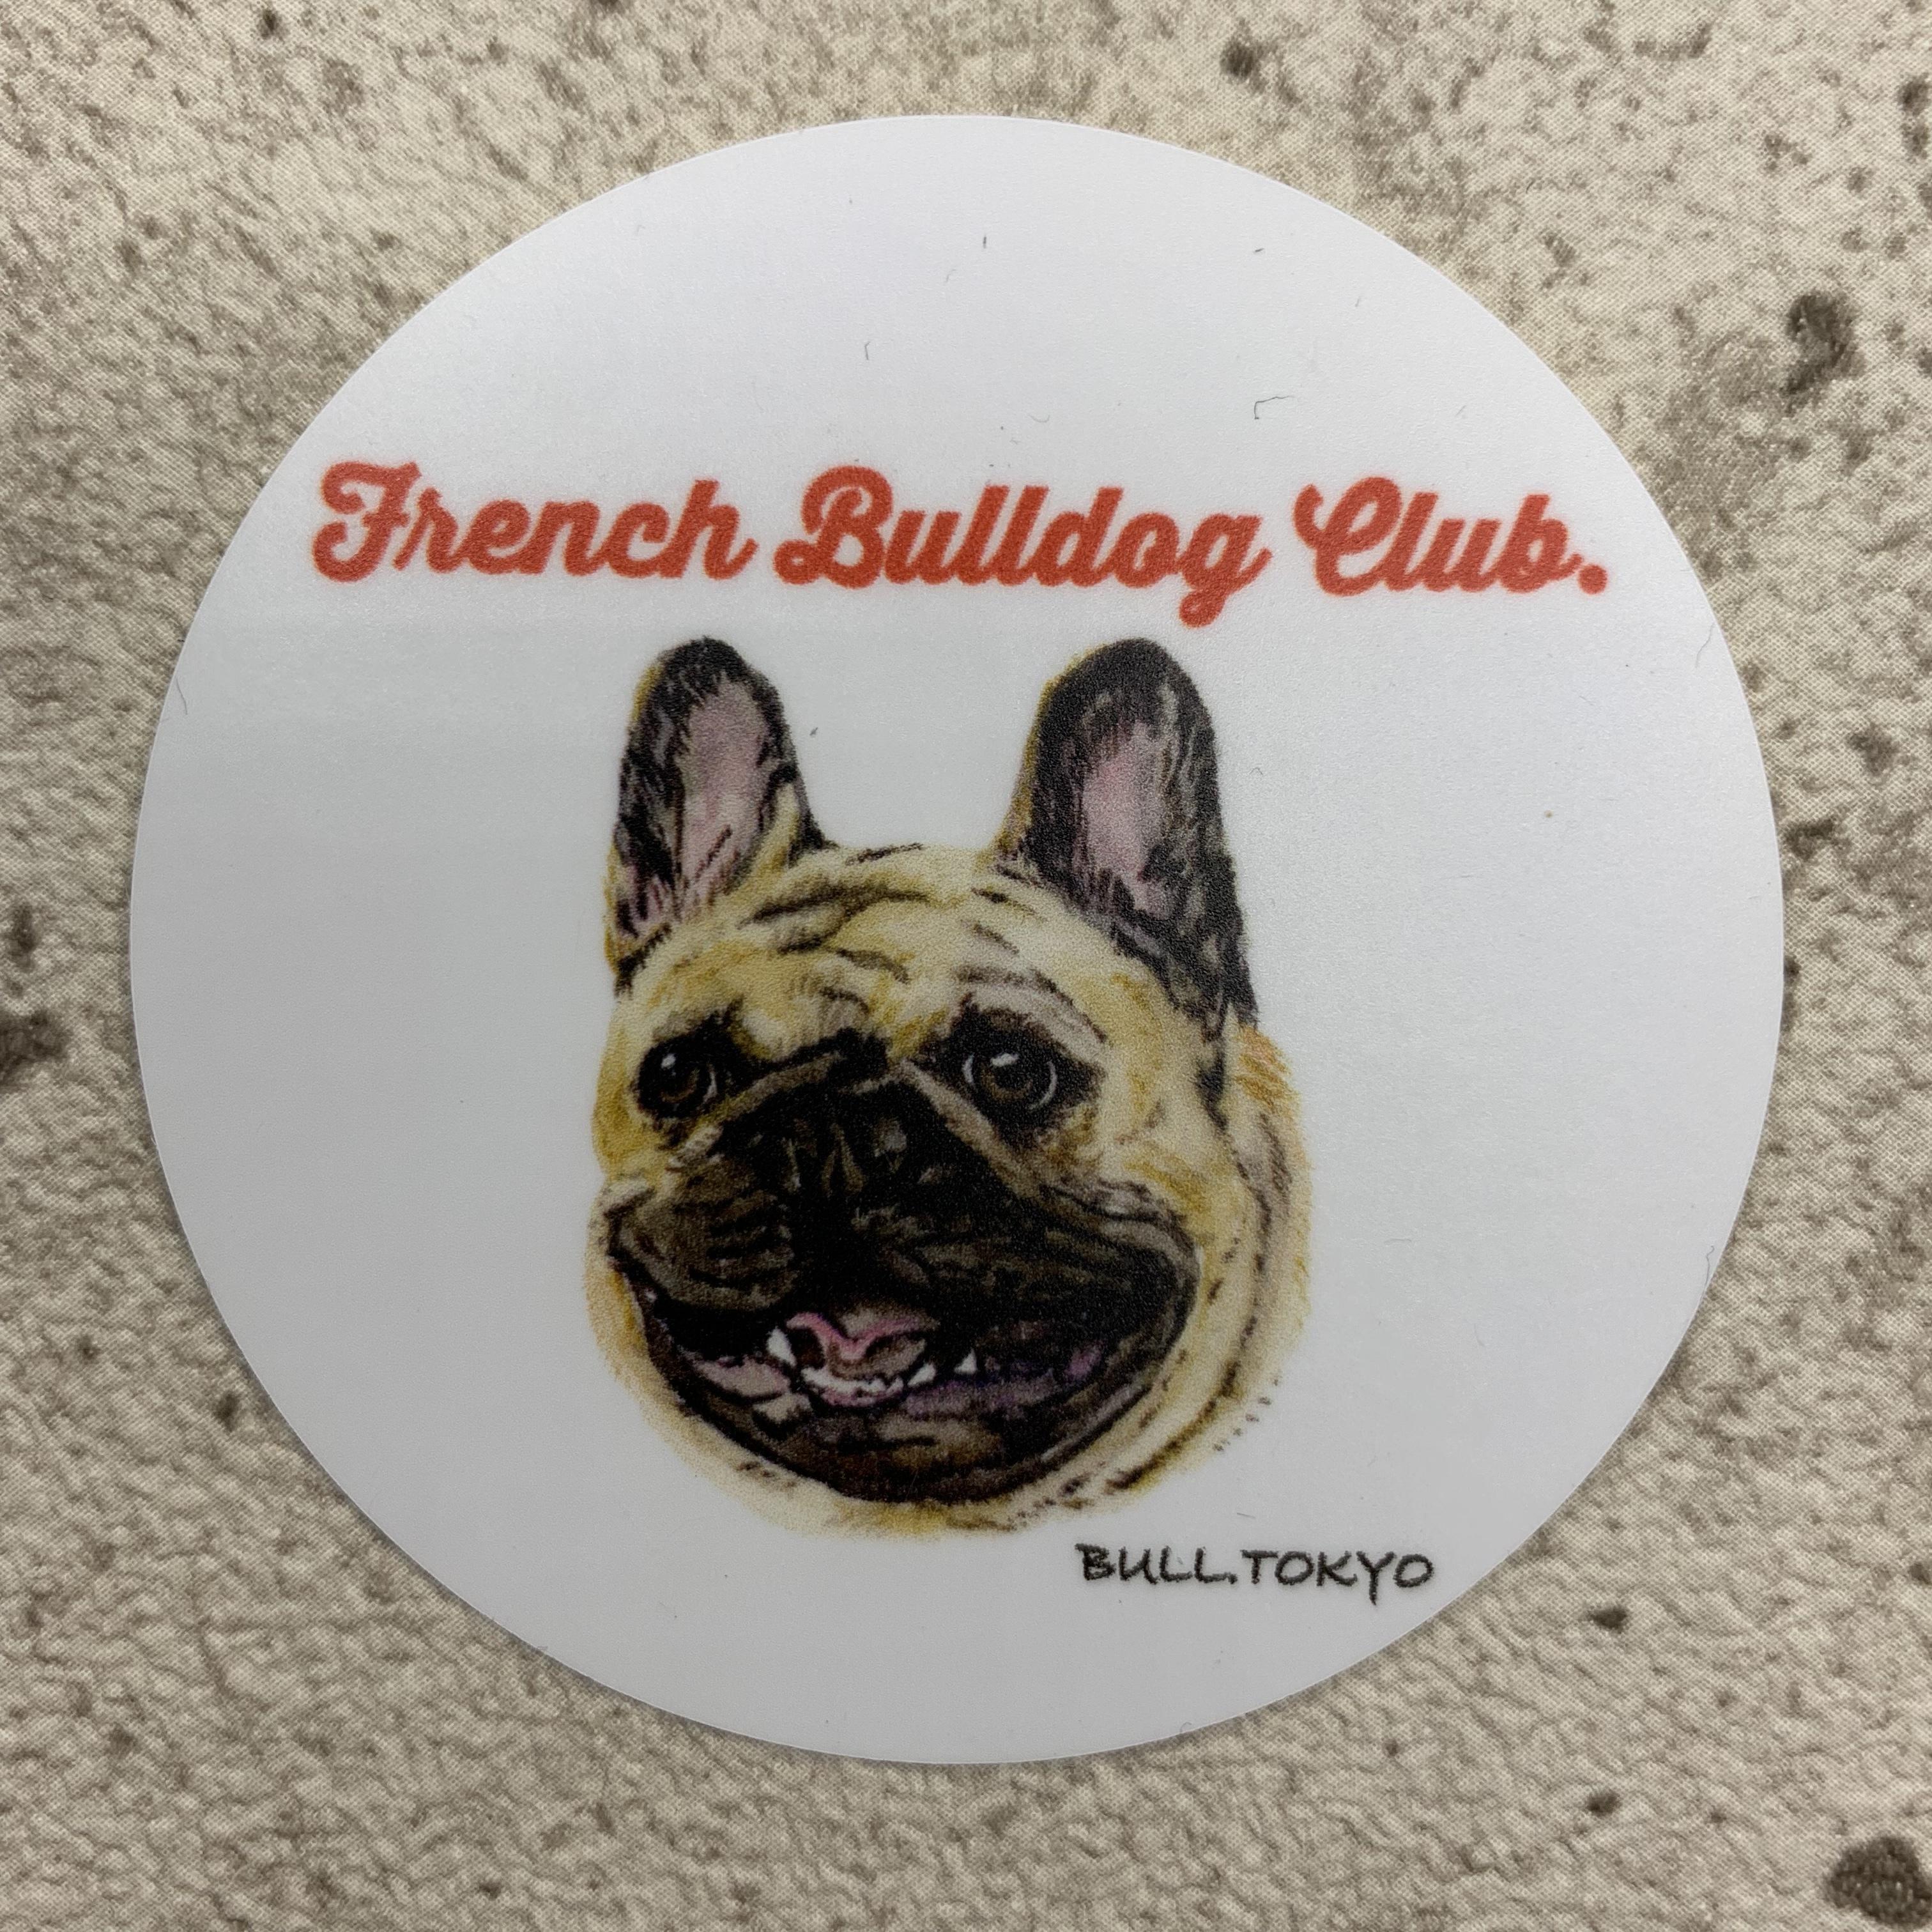 Bull.Tokyo オリジナル ステッカー Part.2 「- French Bulldog Club -」フォーン